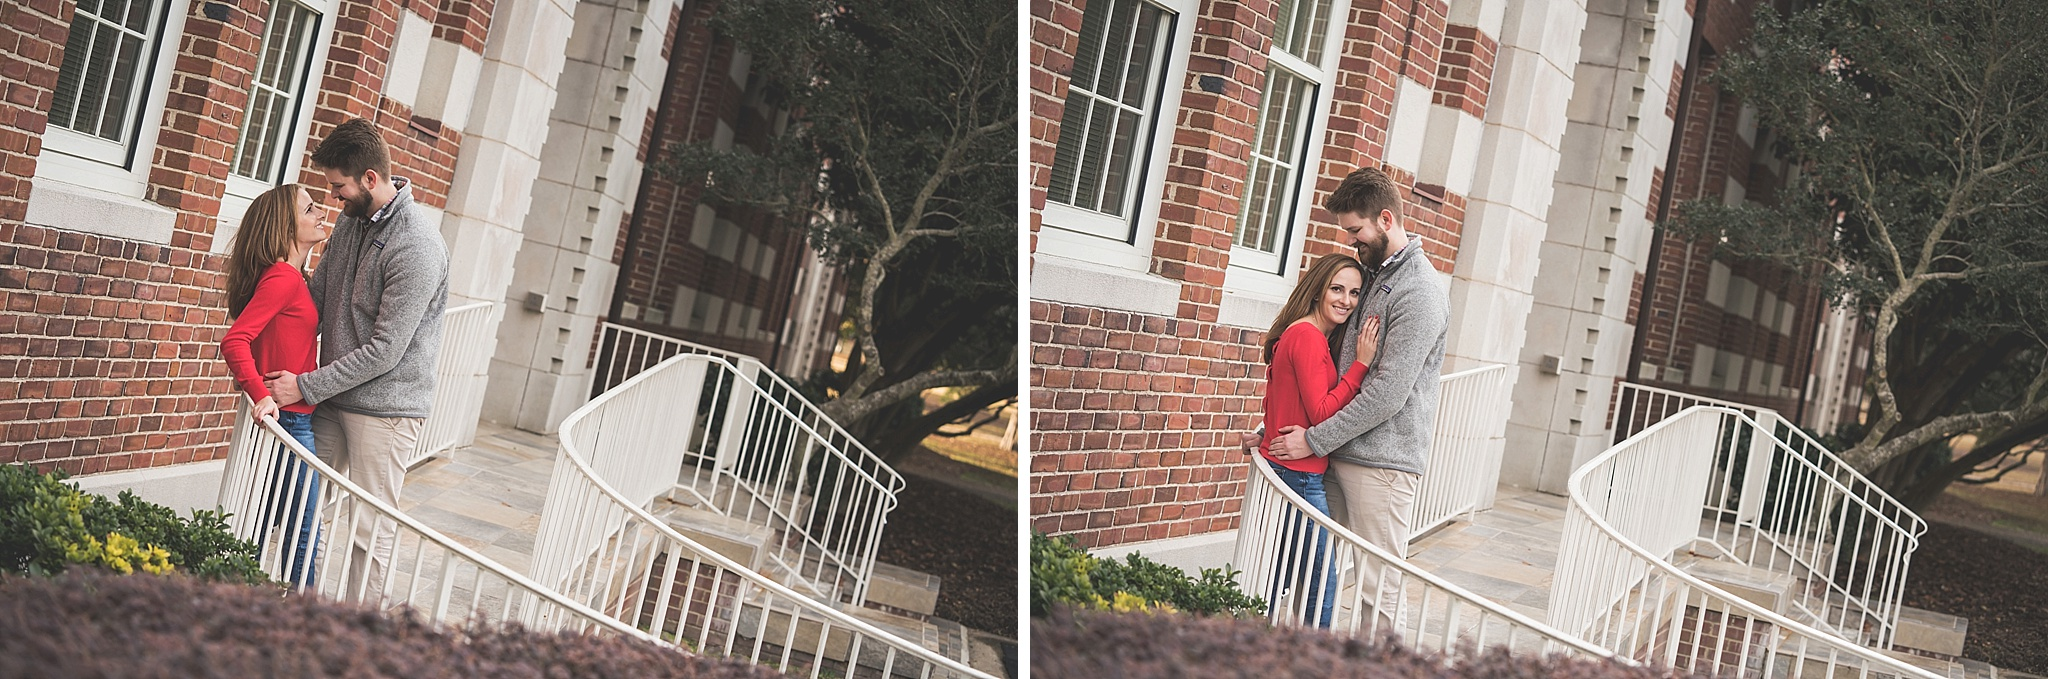 East-Carolina-University-Photographer-65.jpg